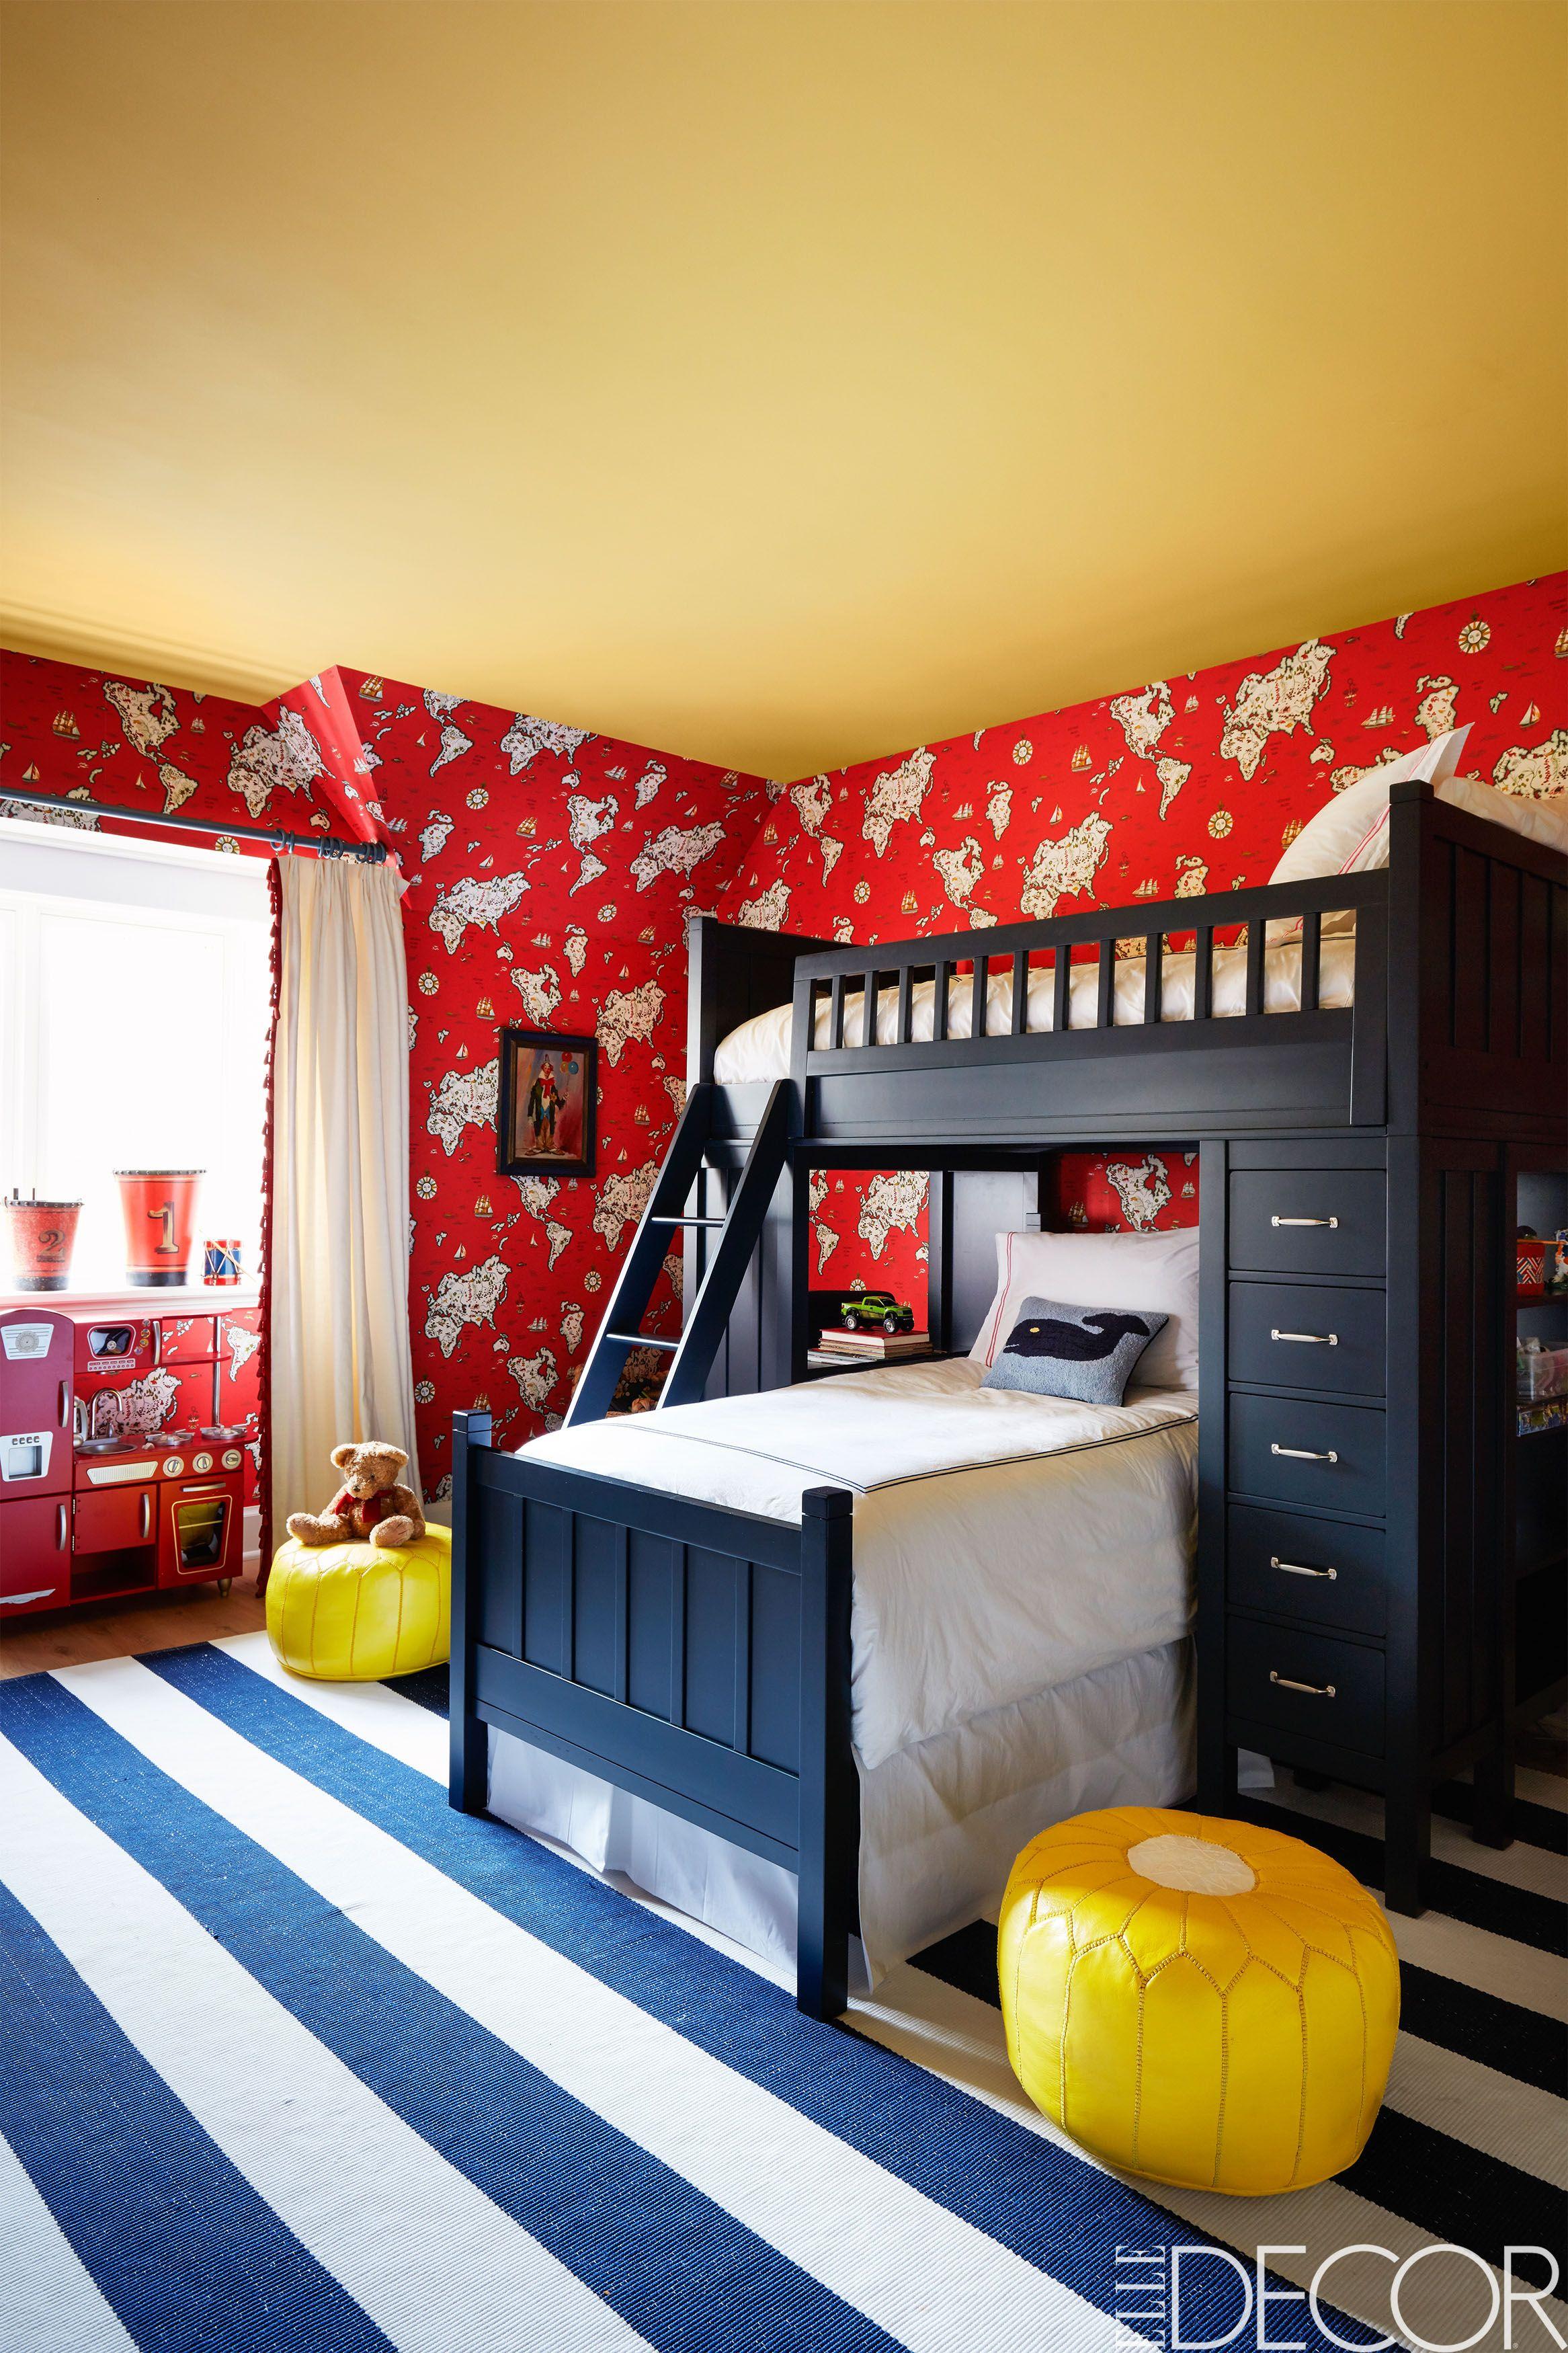 20 amazing boys room ideas how to decorate a boys bedroom rh elledecor com decorate child's bedroom decorating childrens bedroom furniture